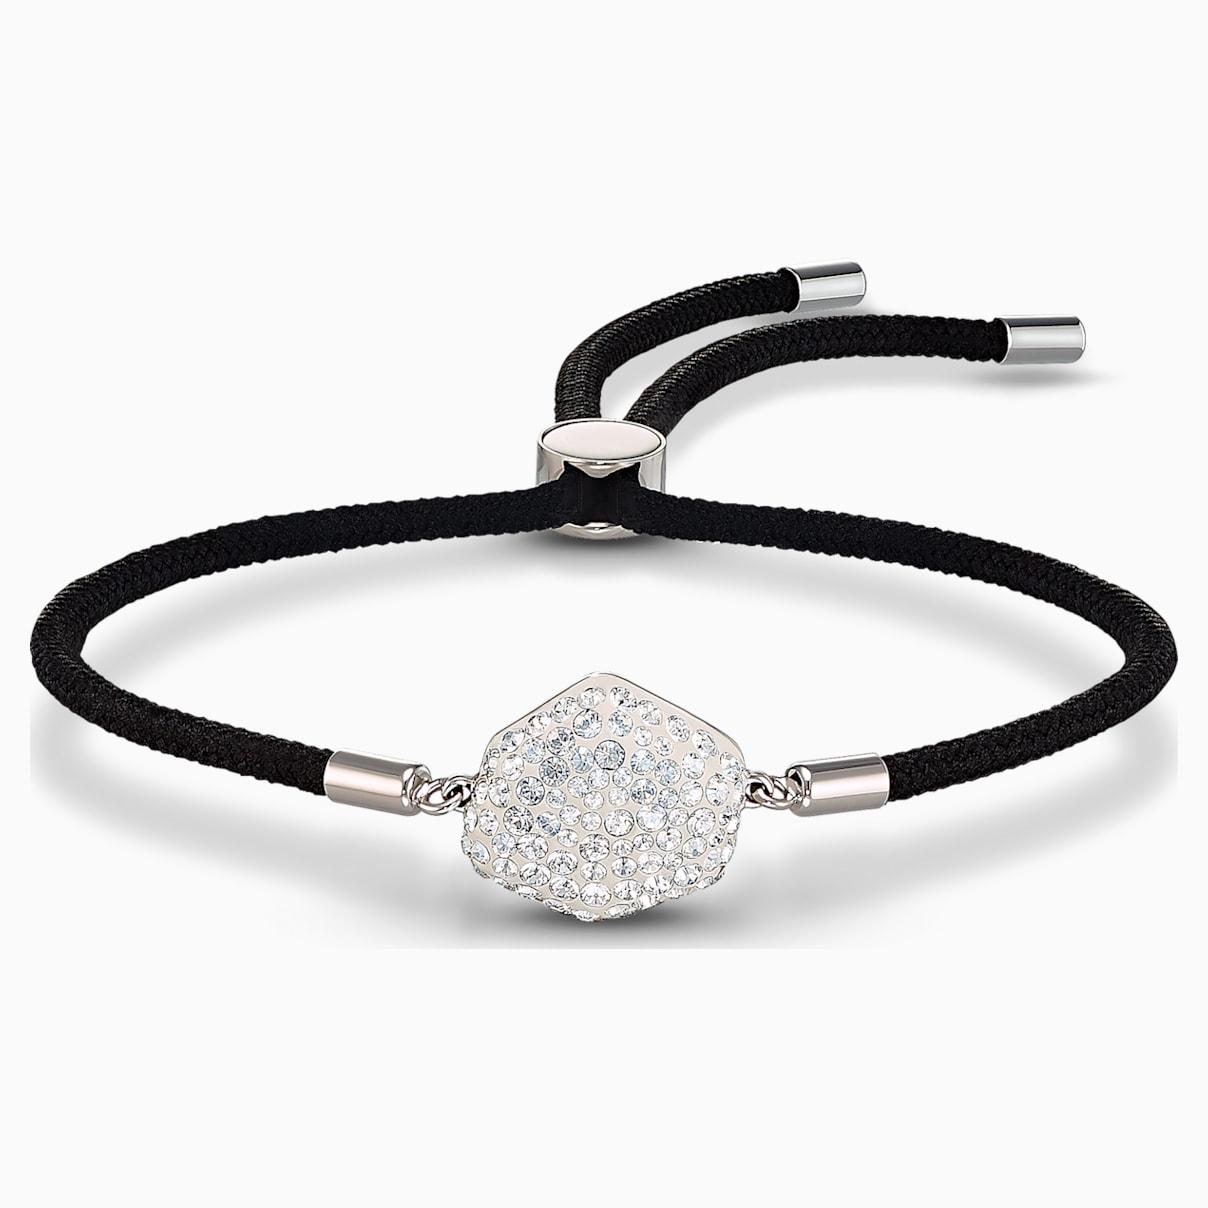 Swarovski Swarovski Power Collection Air Element Bracelet, Black, Stainless  steel from Swarovski - The Magic of Crystal | Accuweather